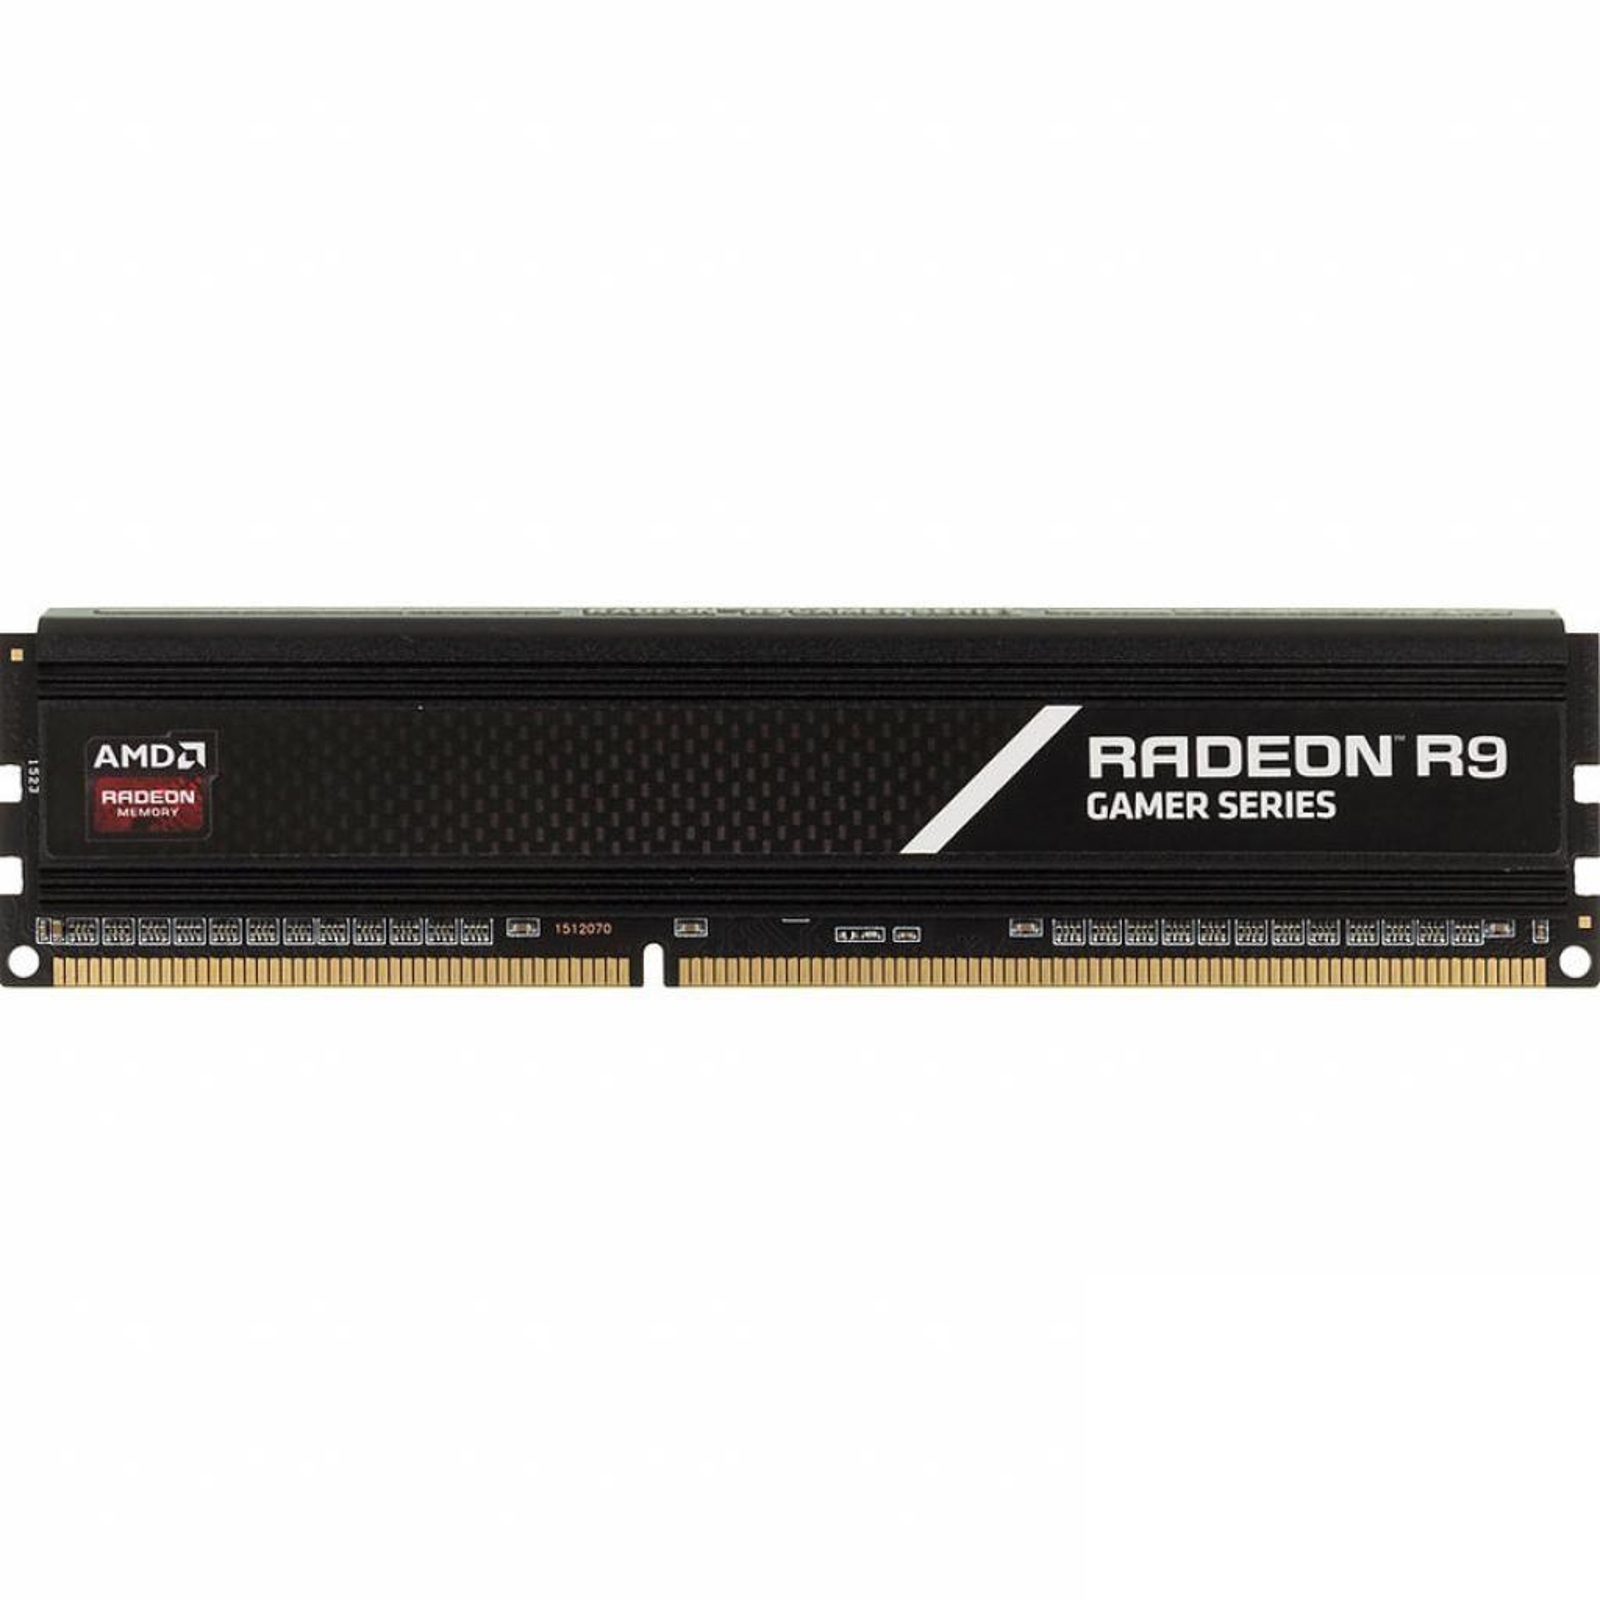 Модуль памяти для компьютера DDR4 8GB 3000 MHz Radeon AMD (R948G3000U2S)